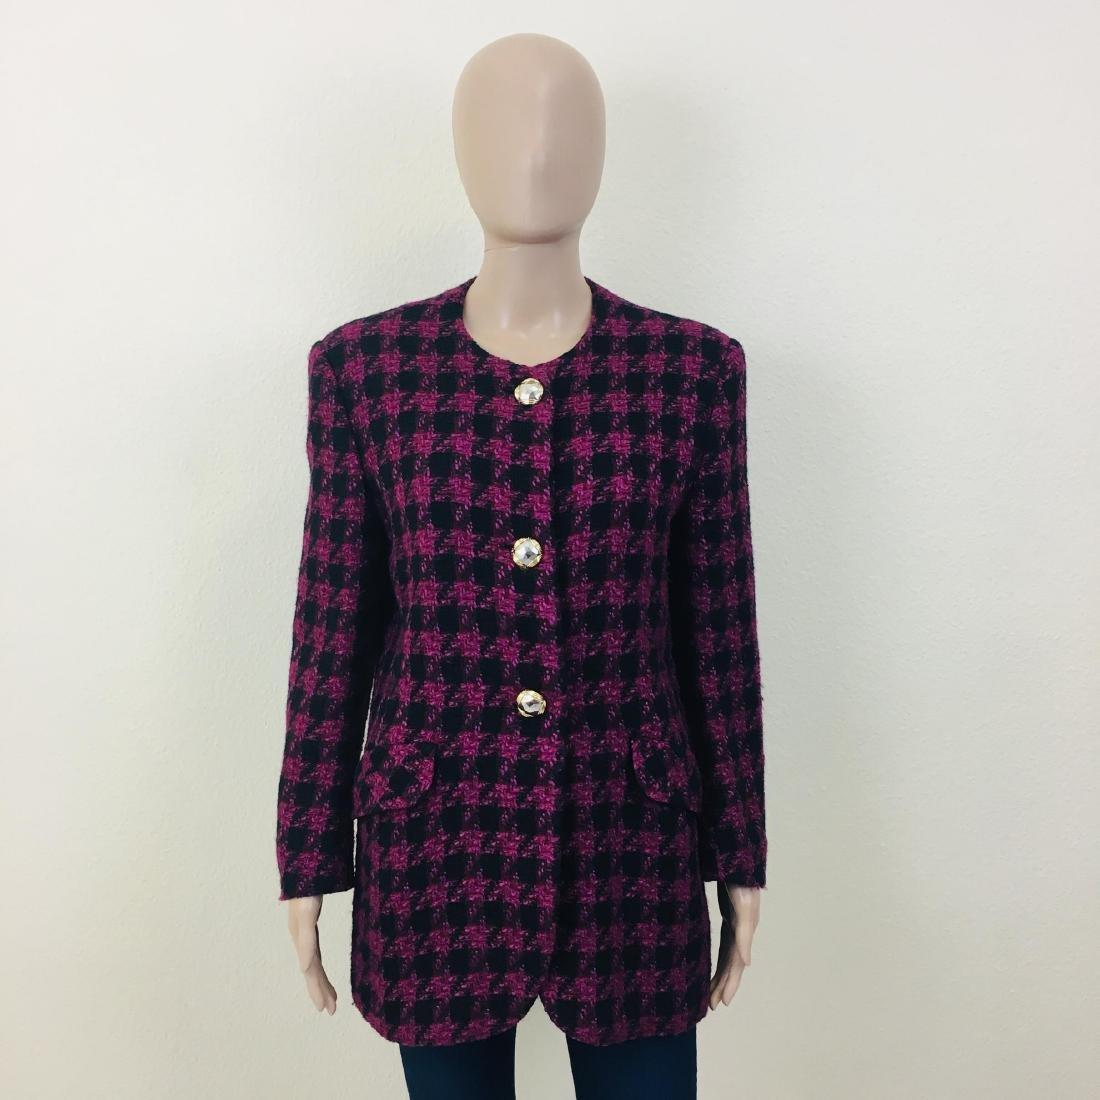 Vintage Women's Uknown Italian Designer Wool Blend